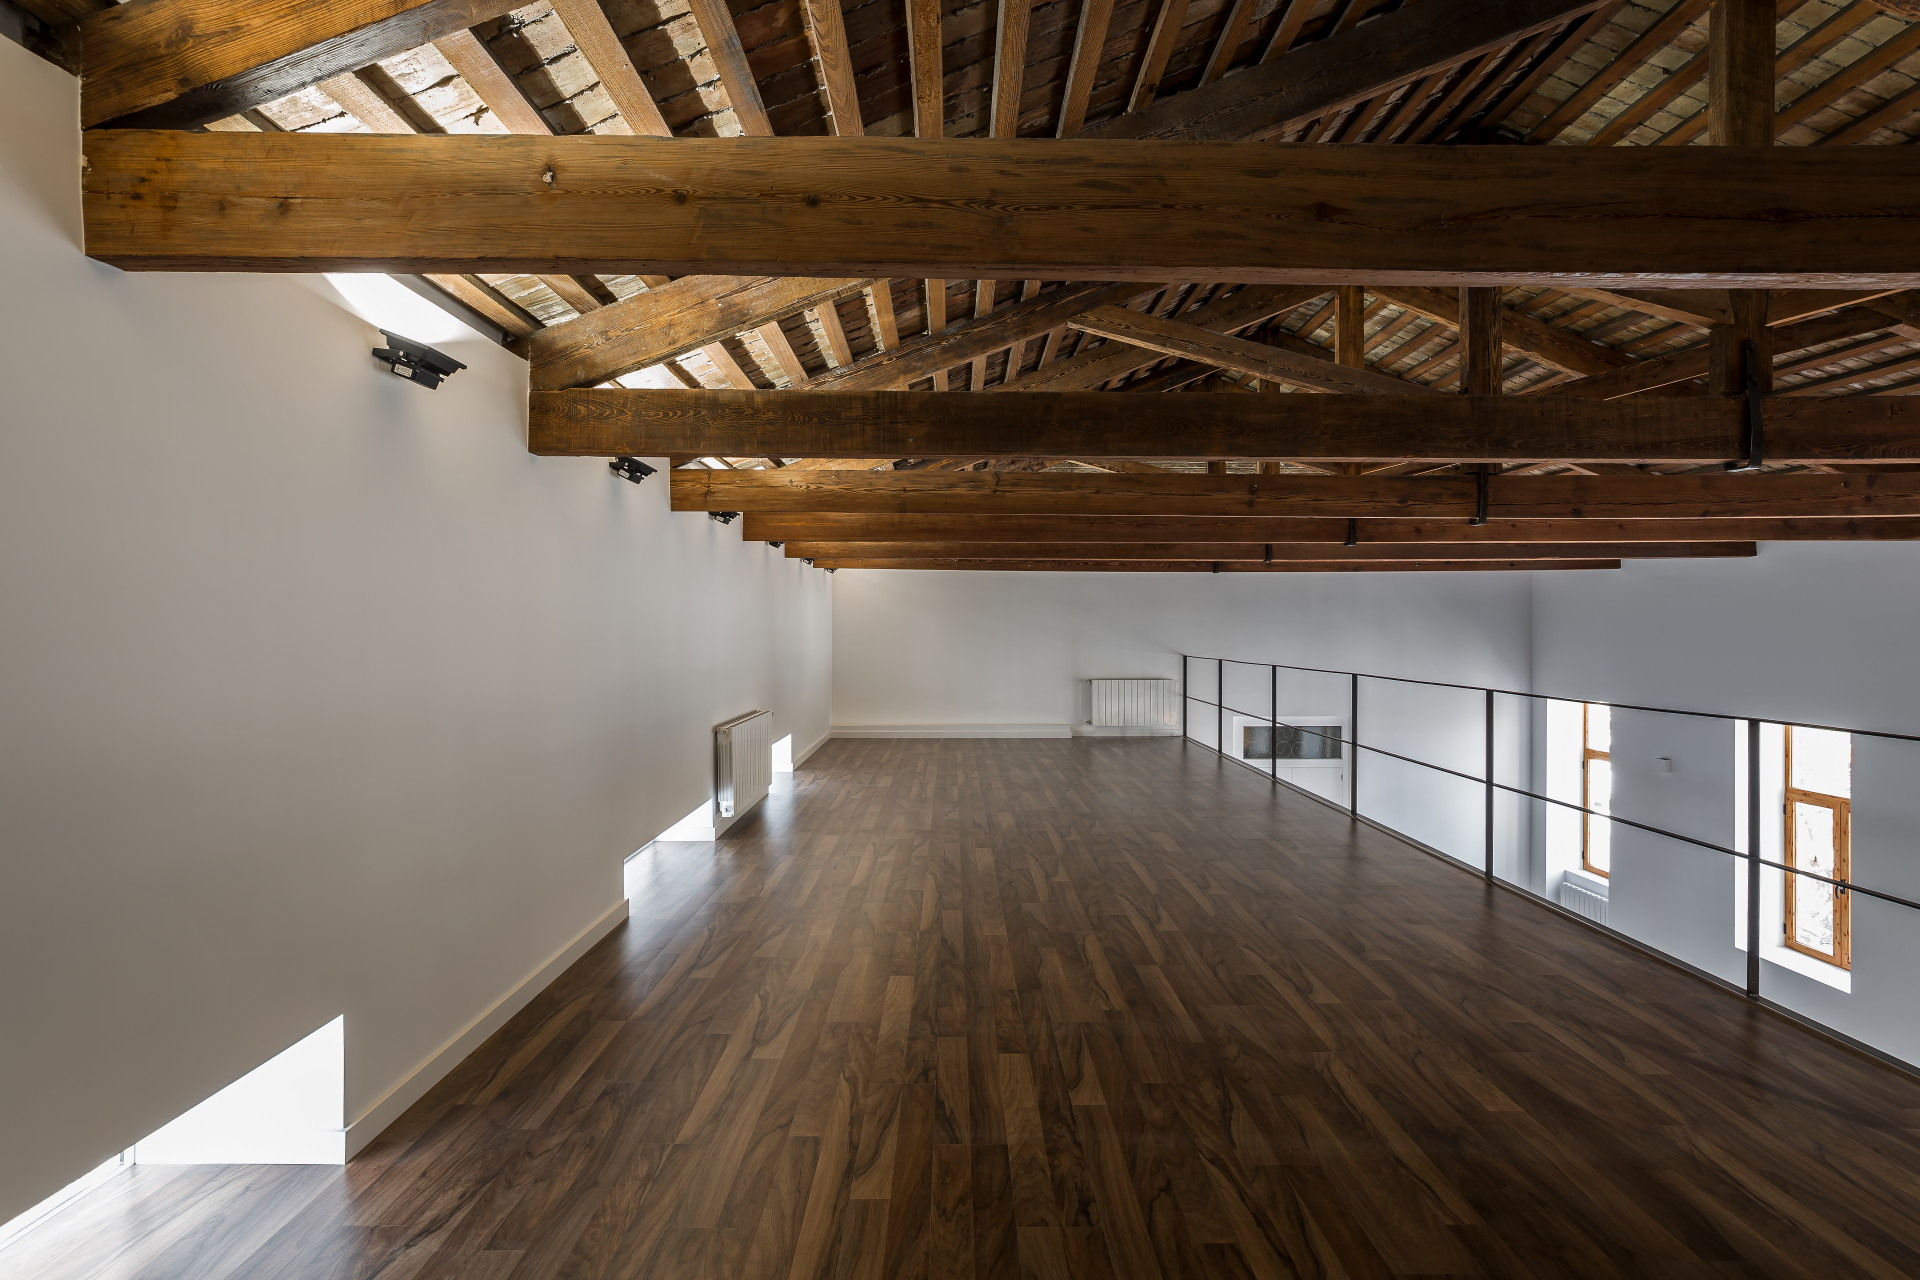 fotografia-arquitectura-valencia-german-cabo-viraje-rehabilitacion-campanar (24)